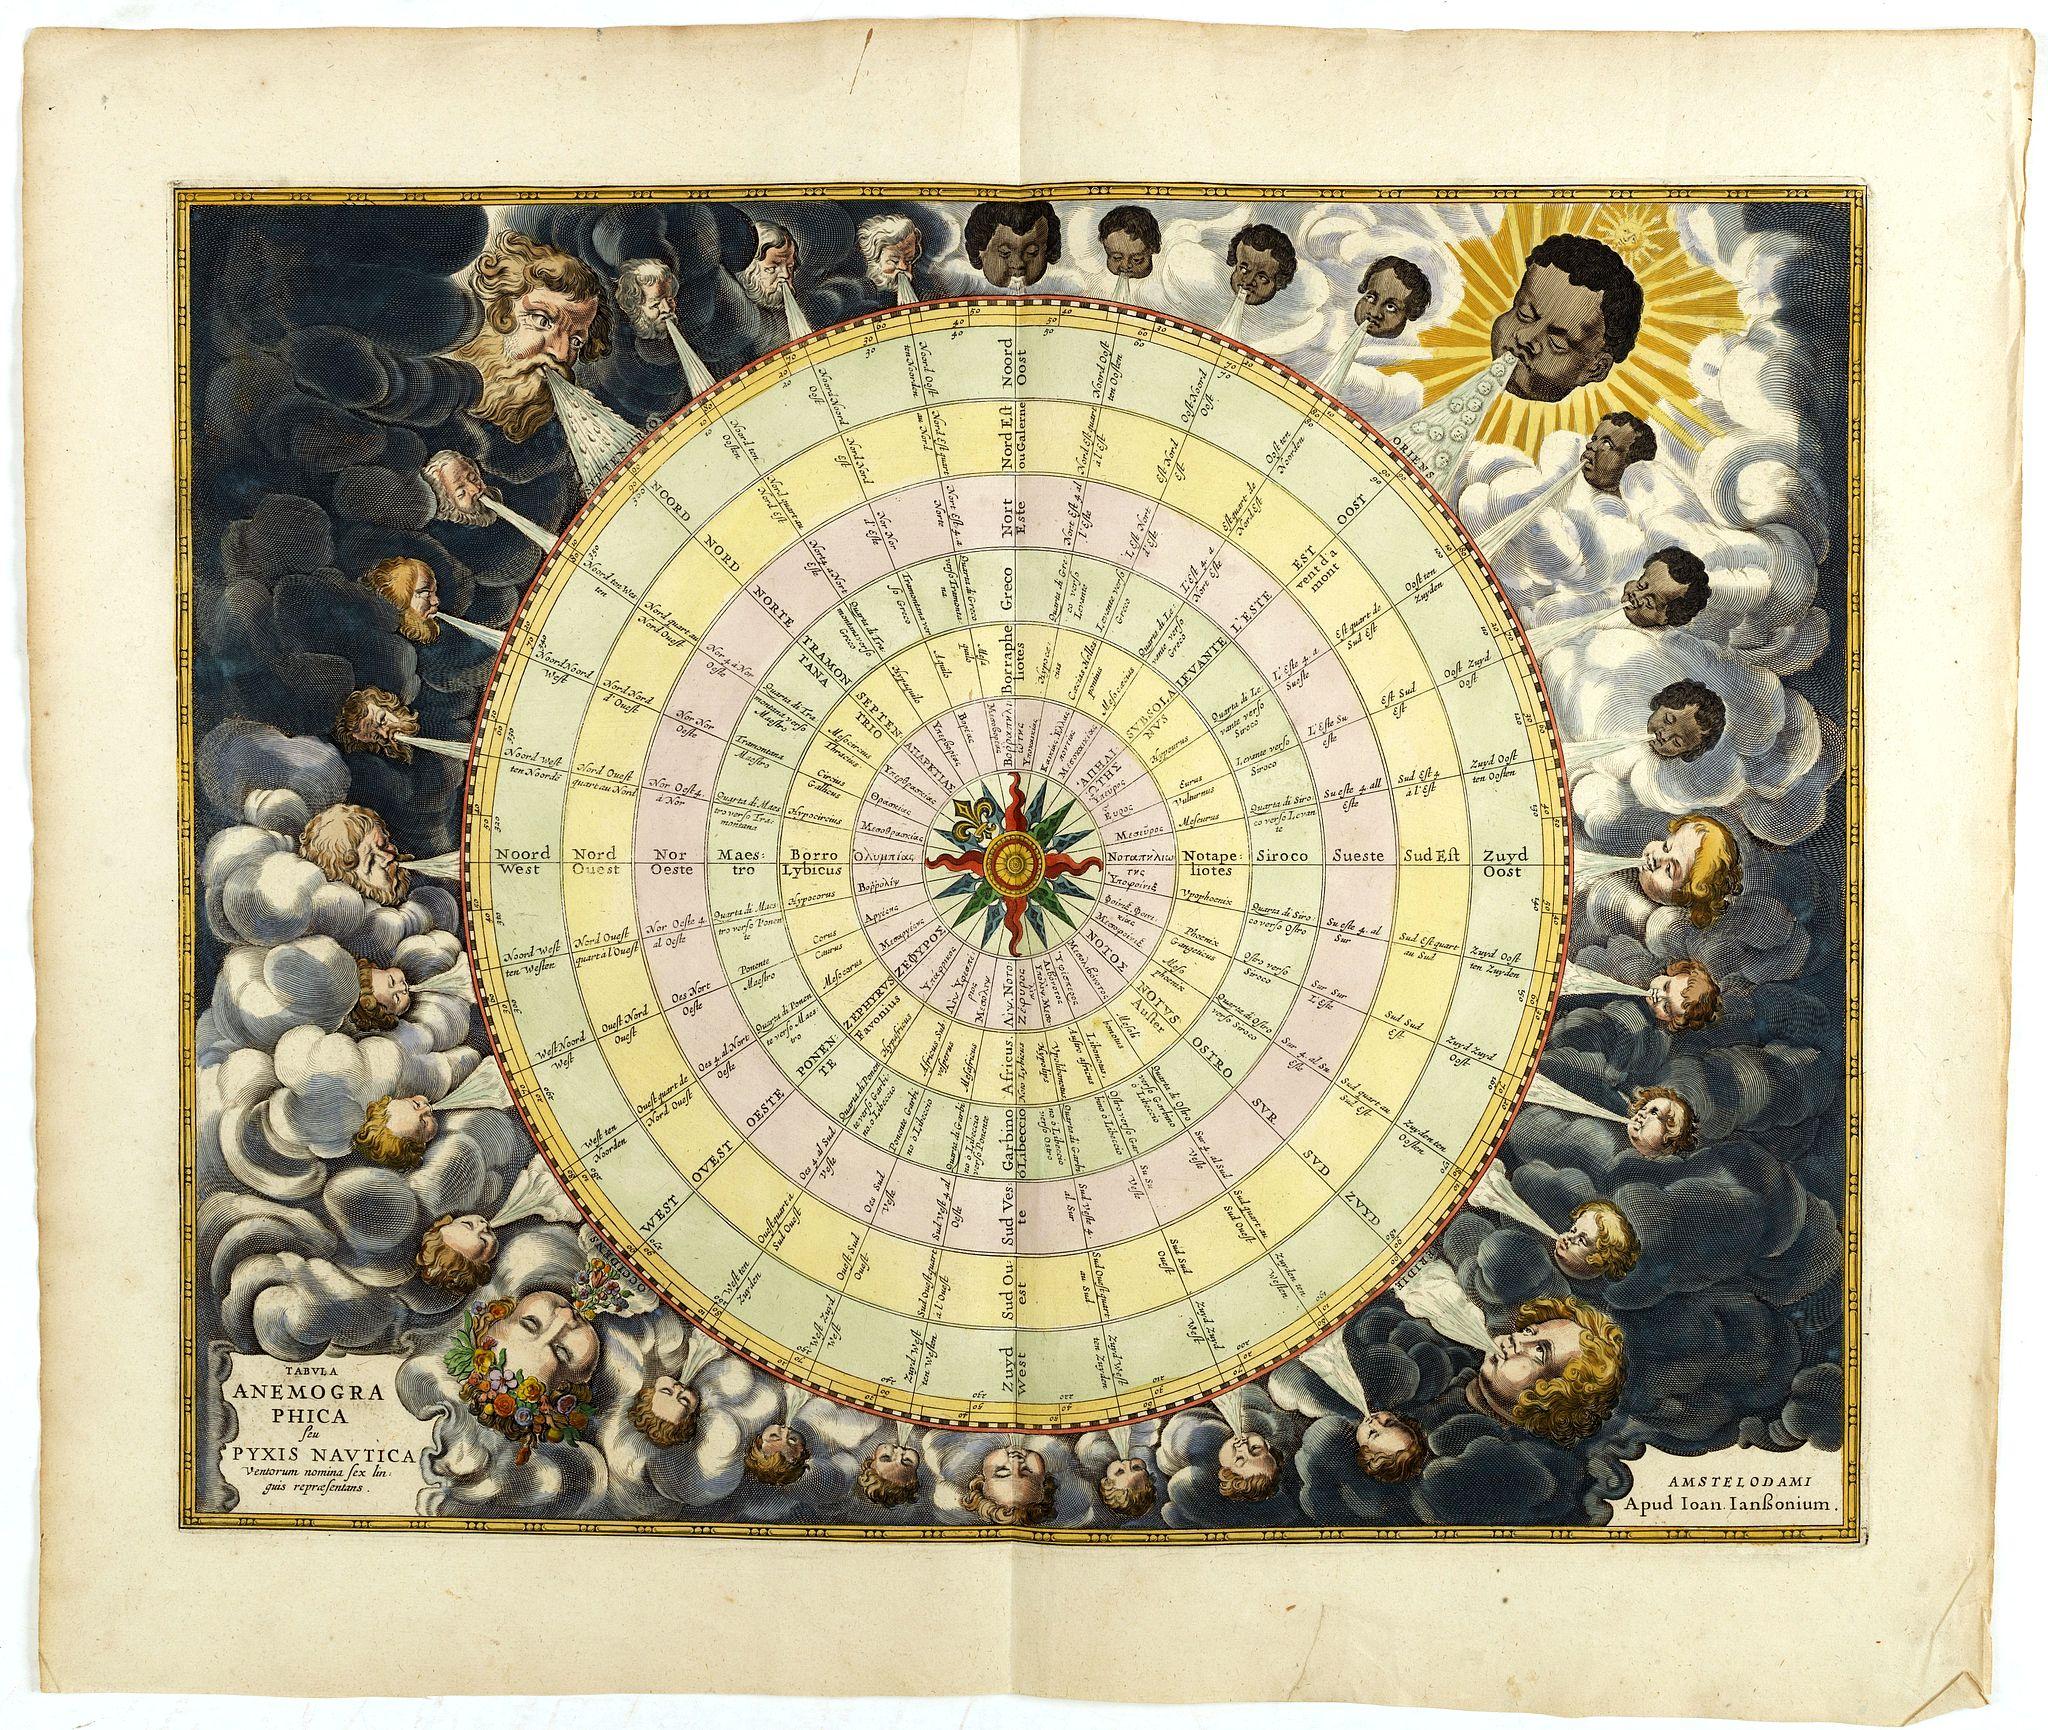 JANSSONIUS, J. -  Tabula Anemographica seu Pyxis Nautica.